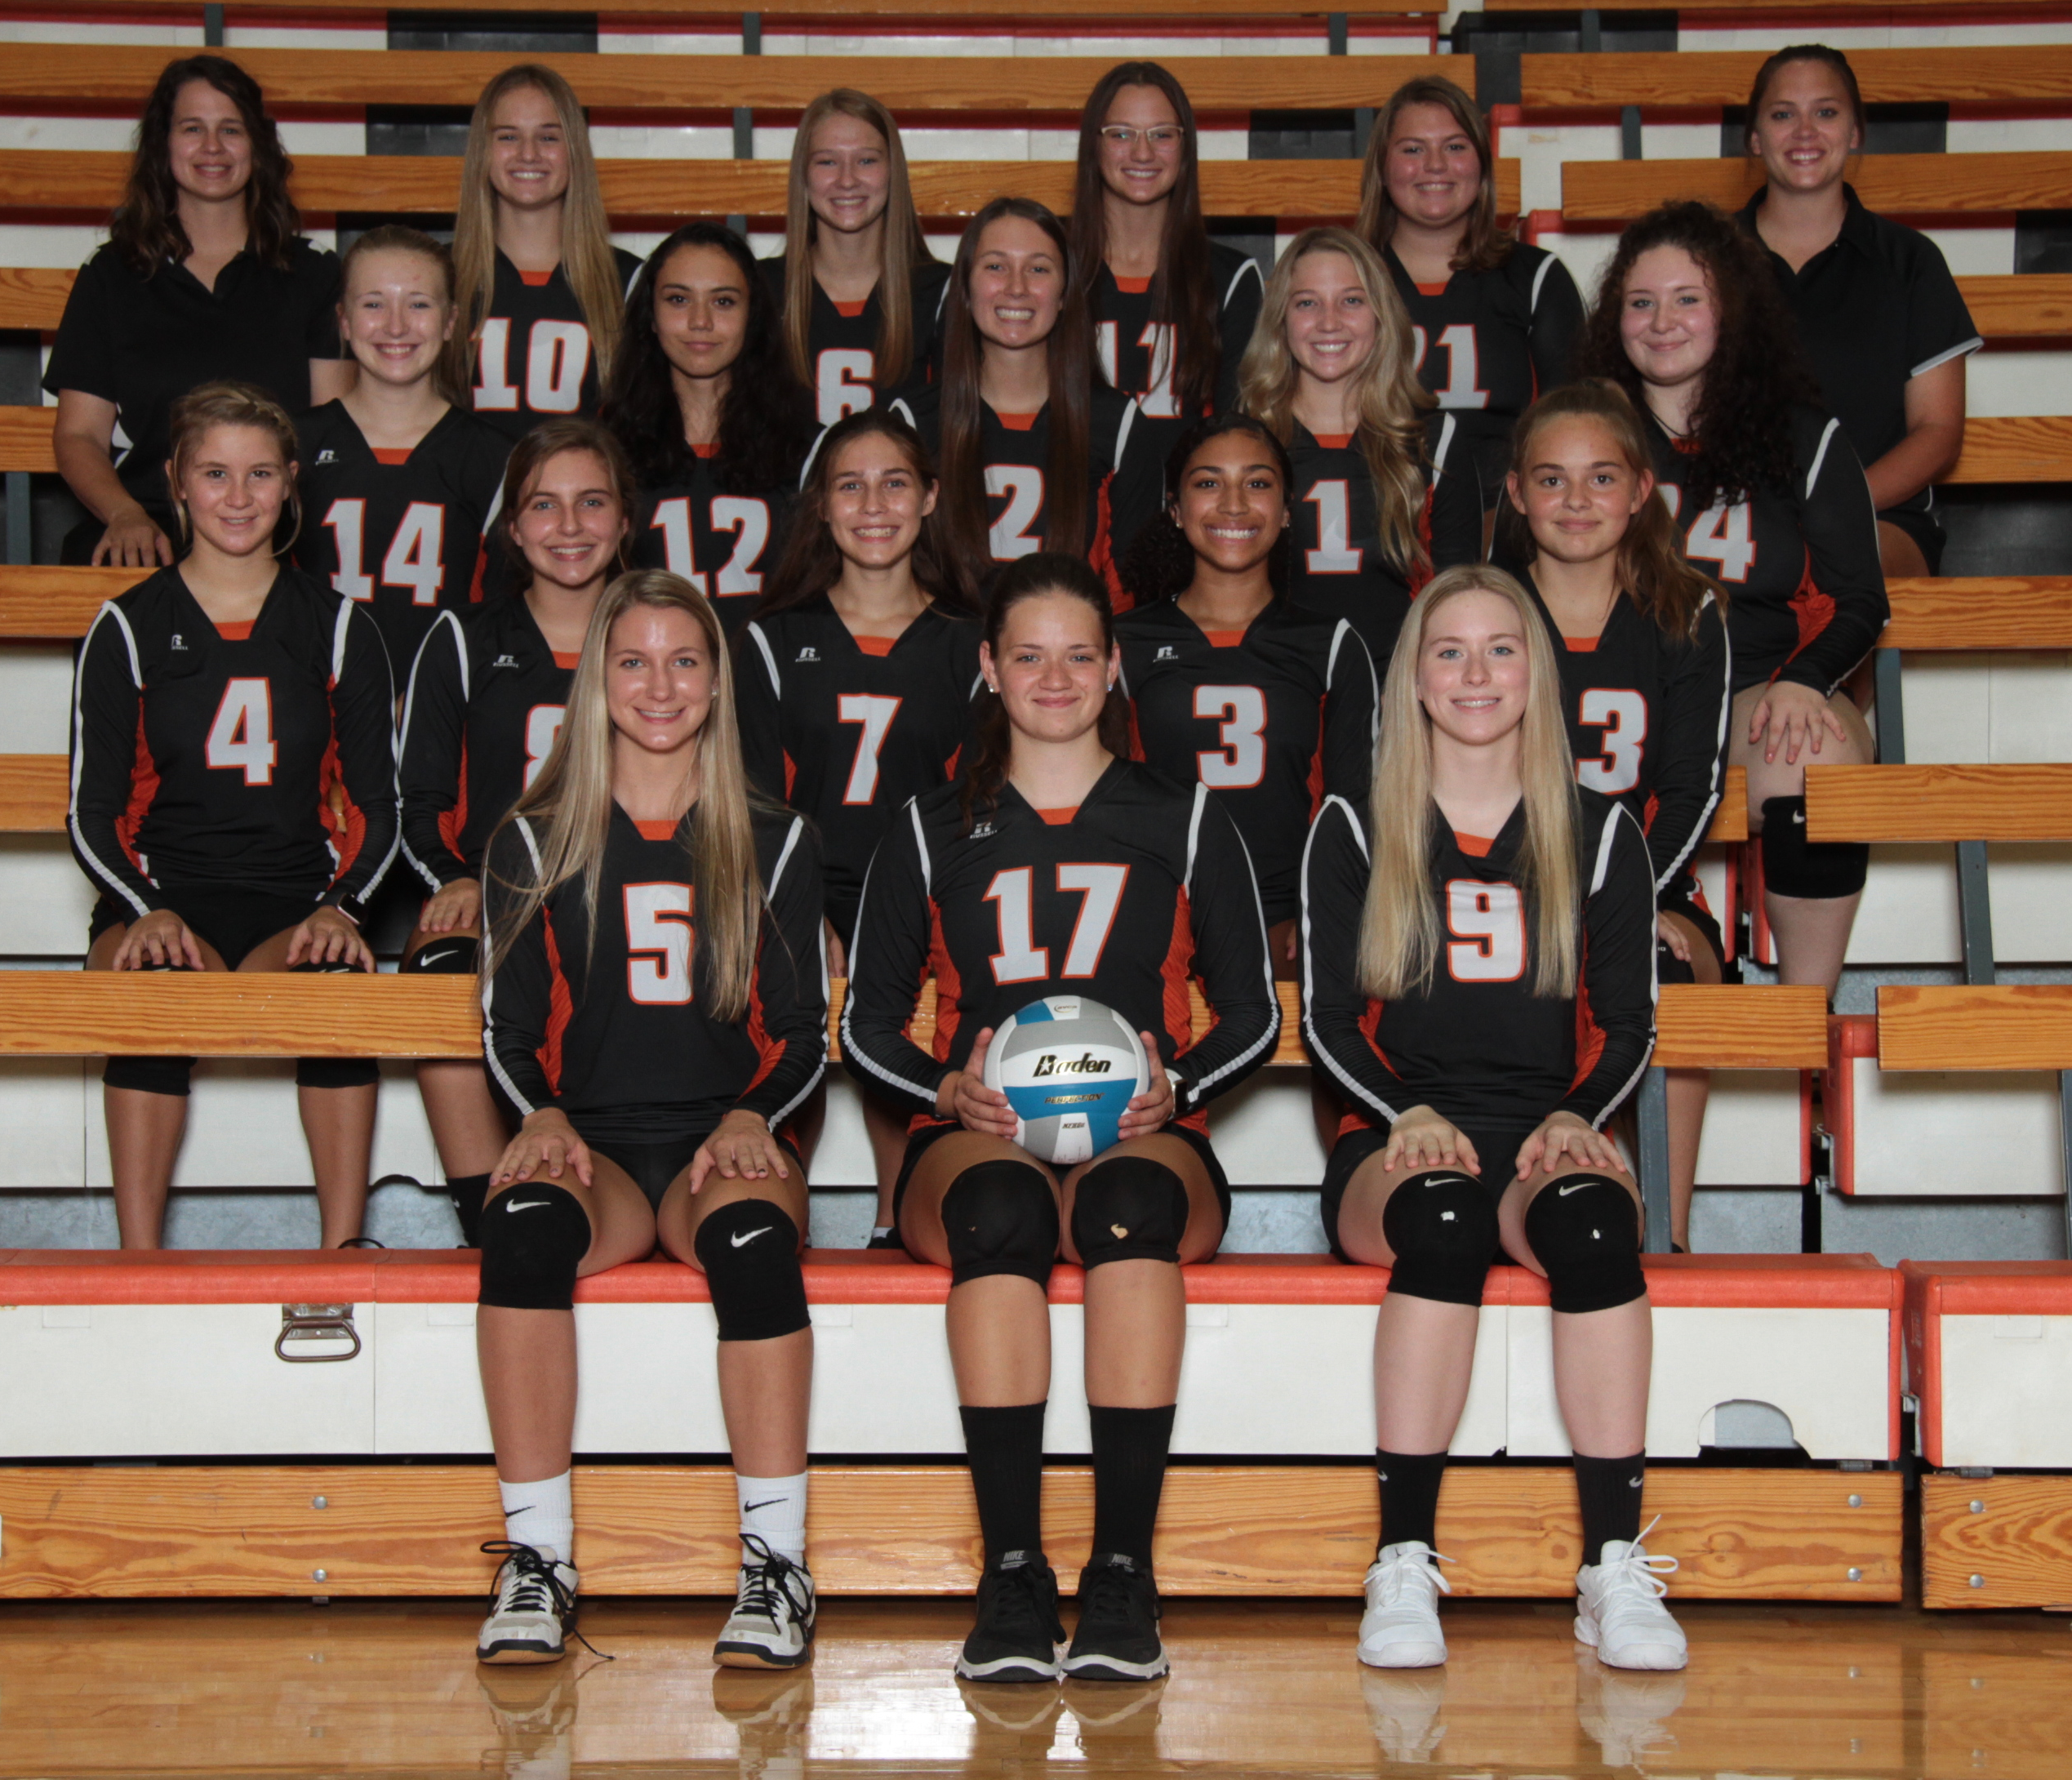 2020 Volleyball Team Photo